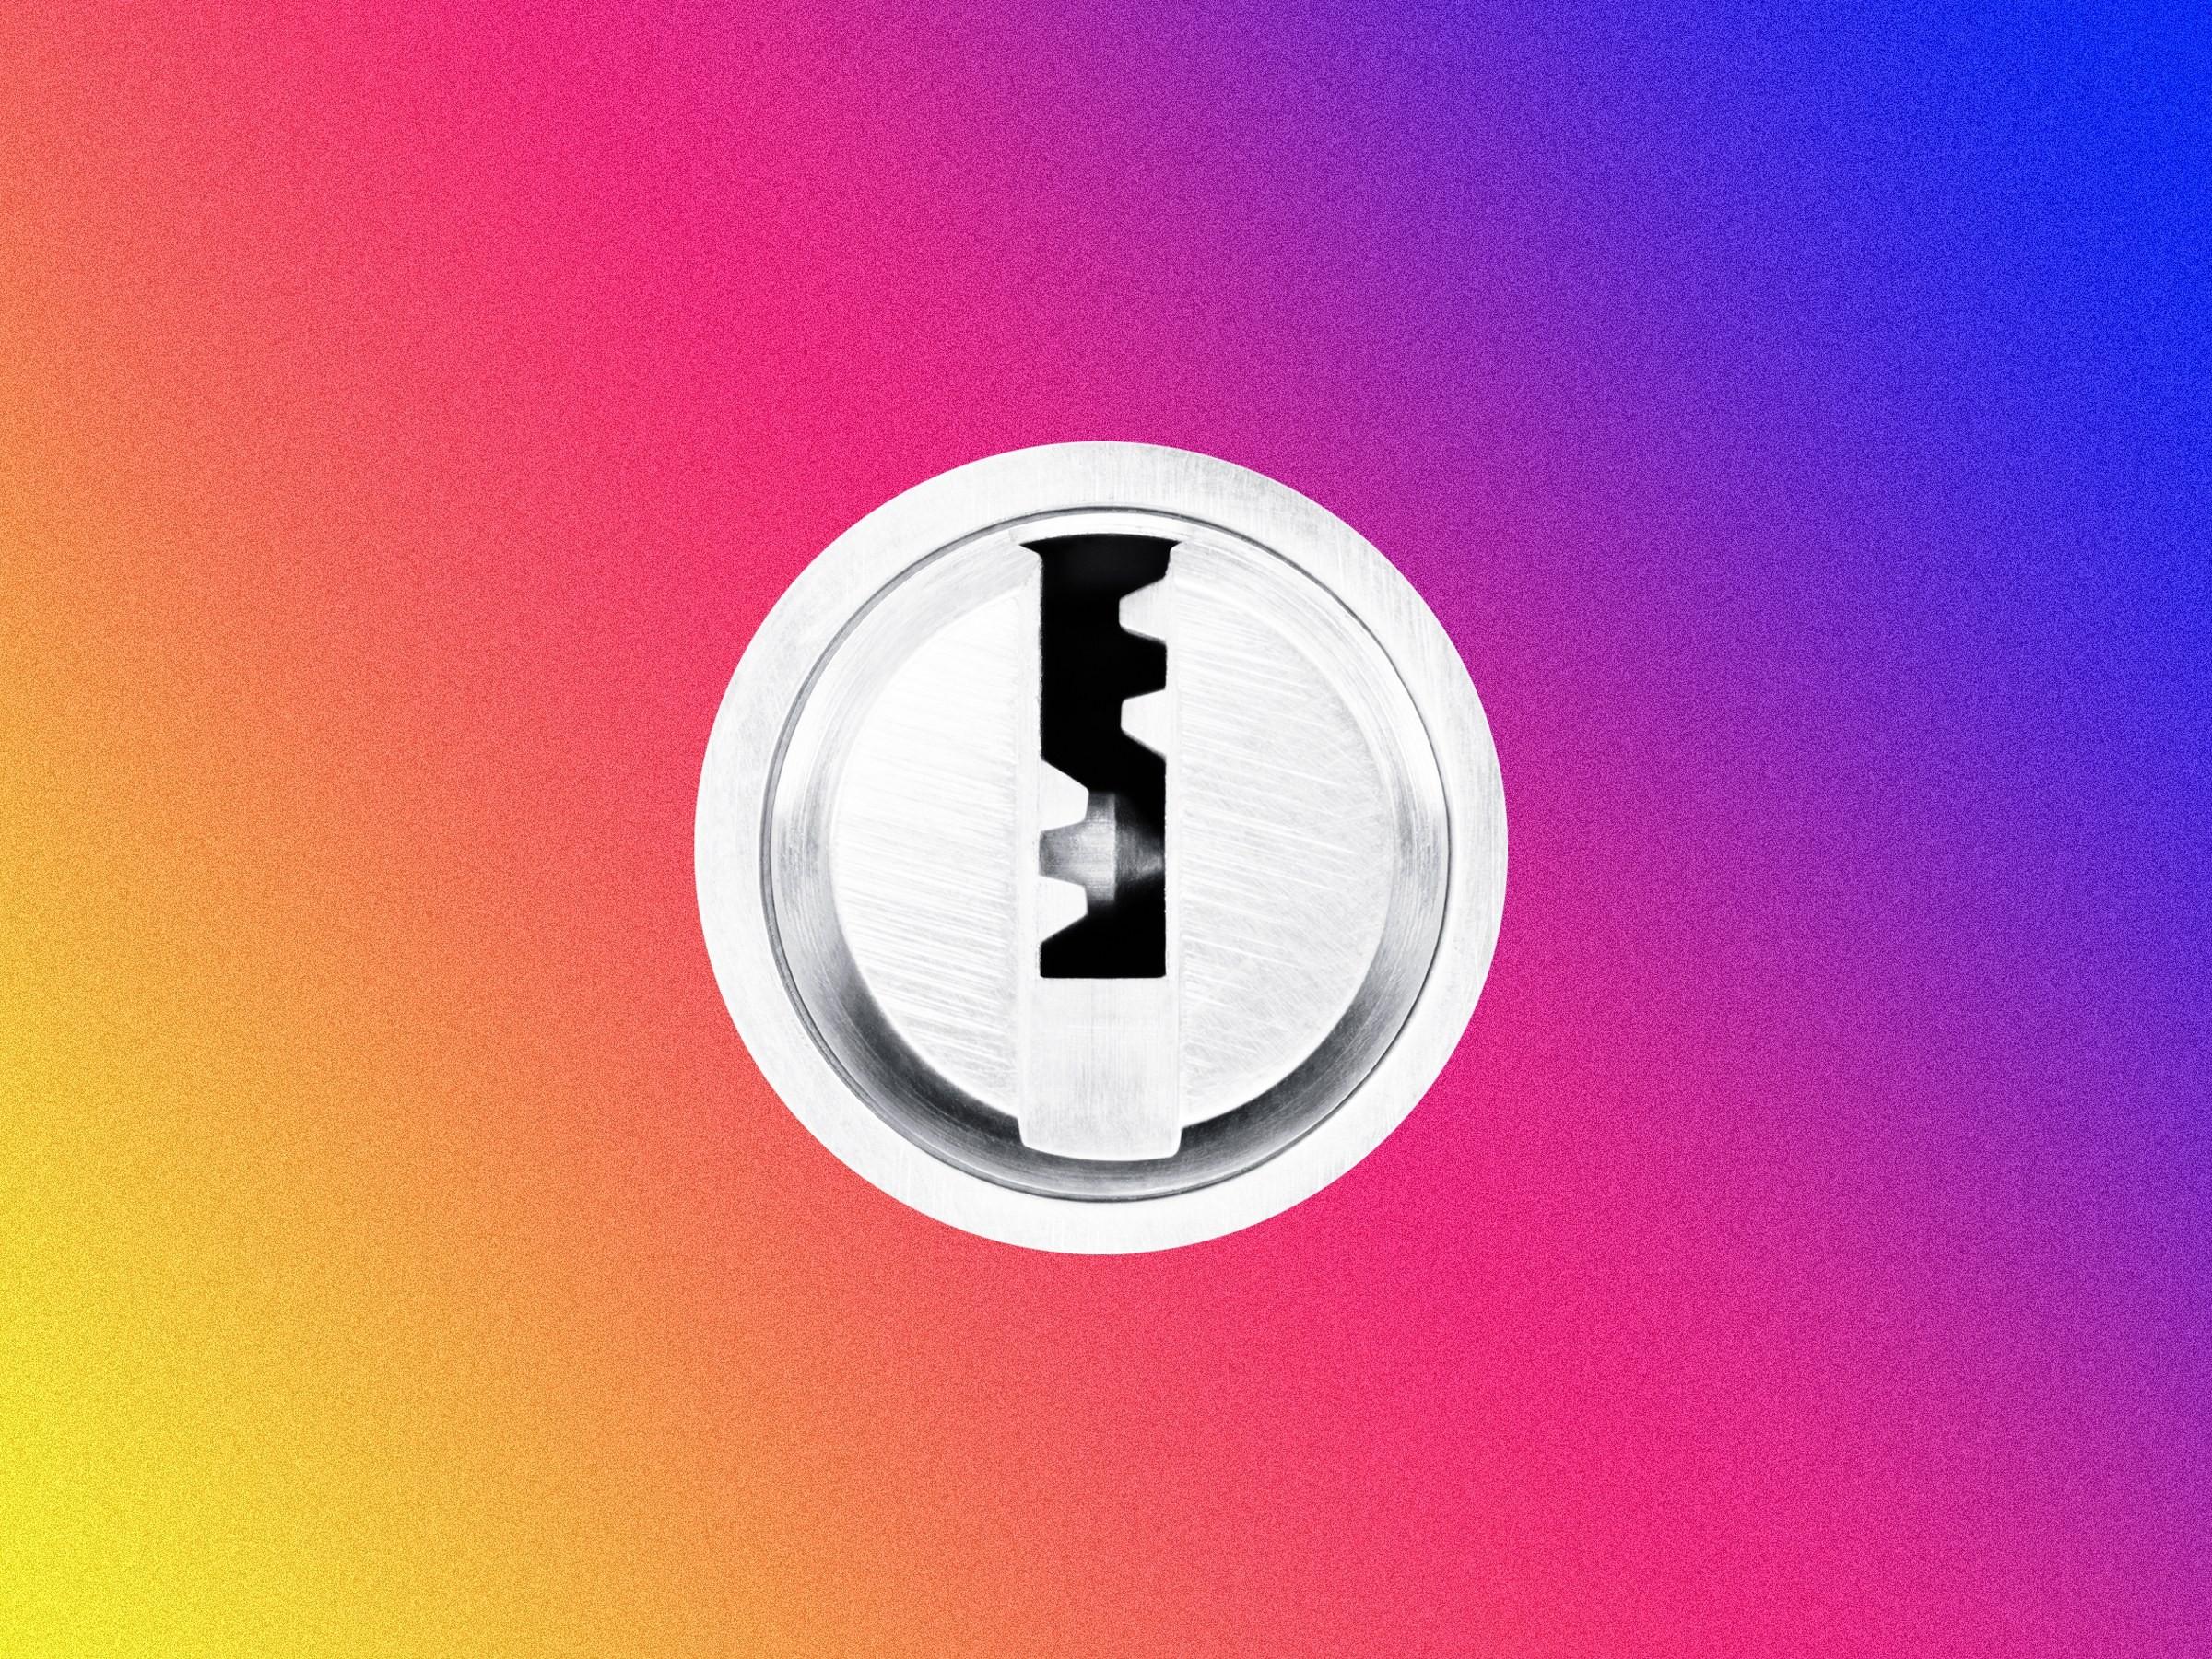 instagramsecurity 1 - بالا بردن امنیت پیج اینستاگرام در 5 مرحله به صورت حرفه ای